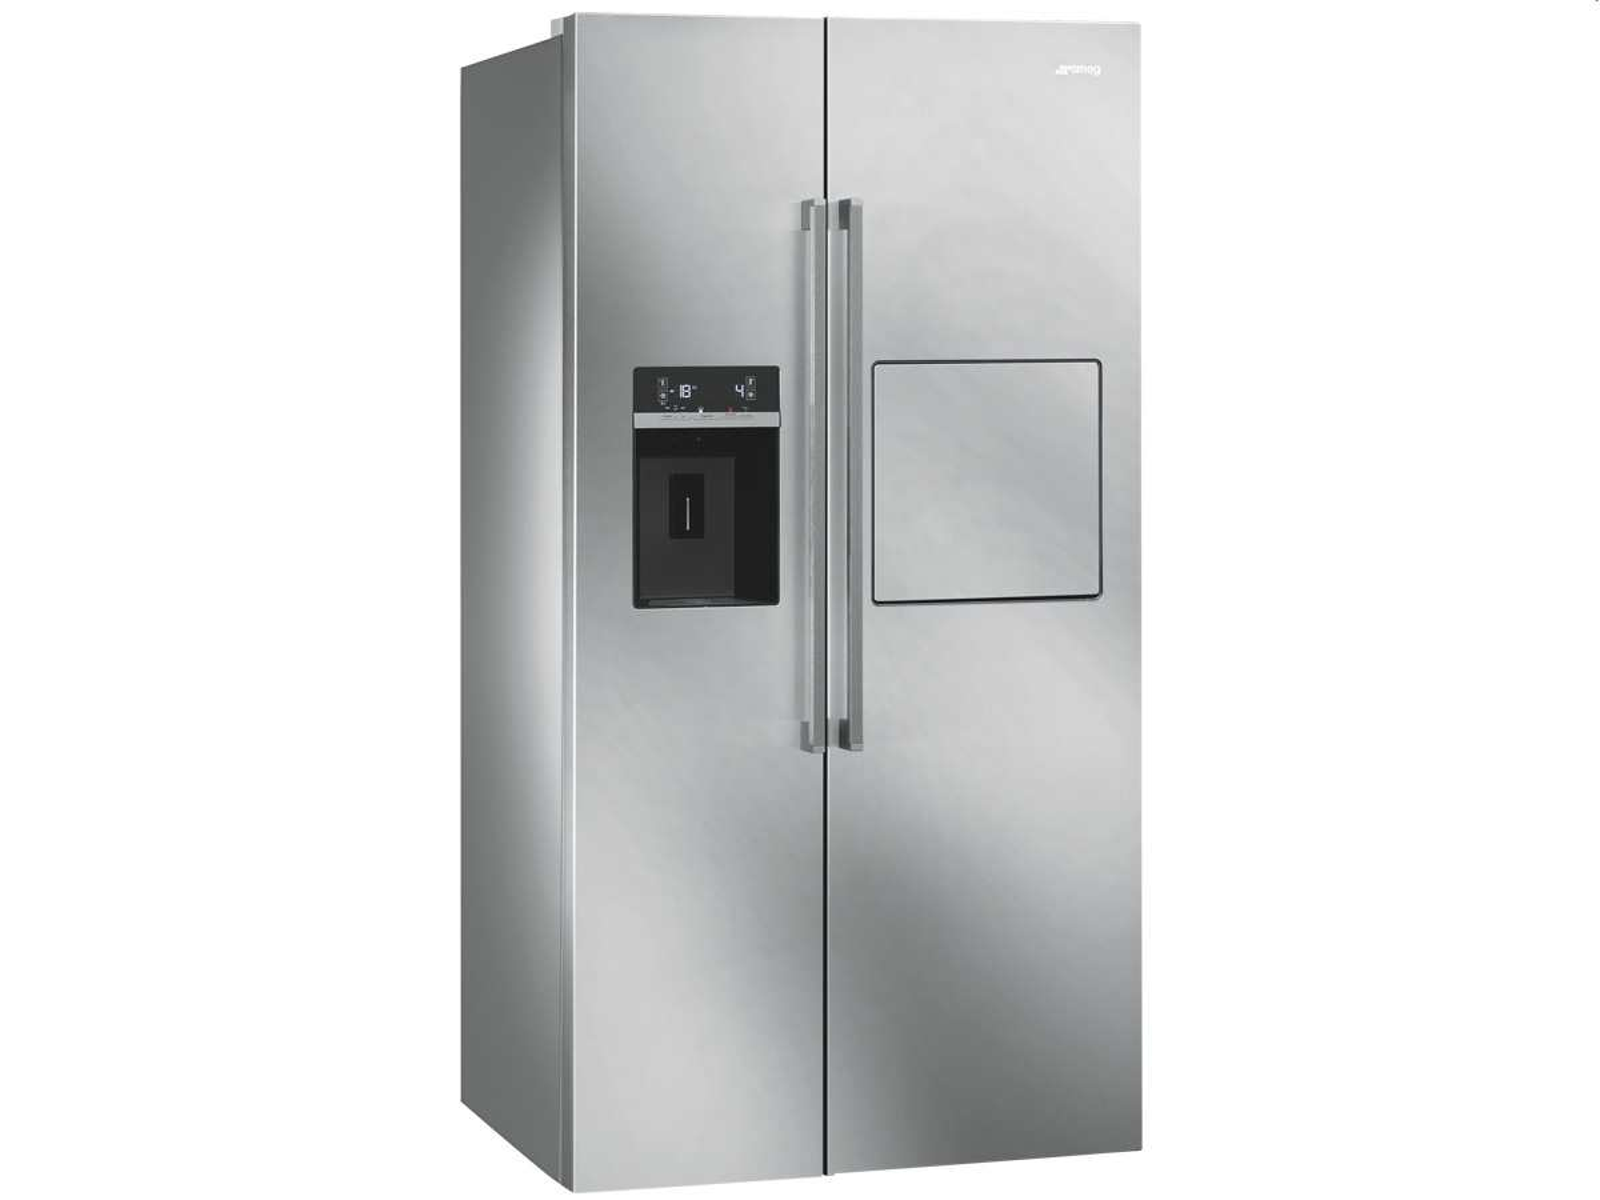 Smeg Kühlschrank Eiswürfel : Smeg sbs pedh side by side kühl gefrier kombination edelstahl